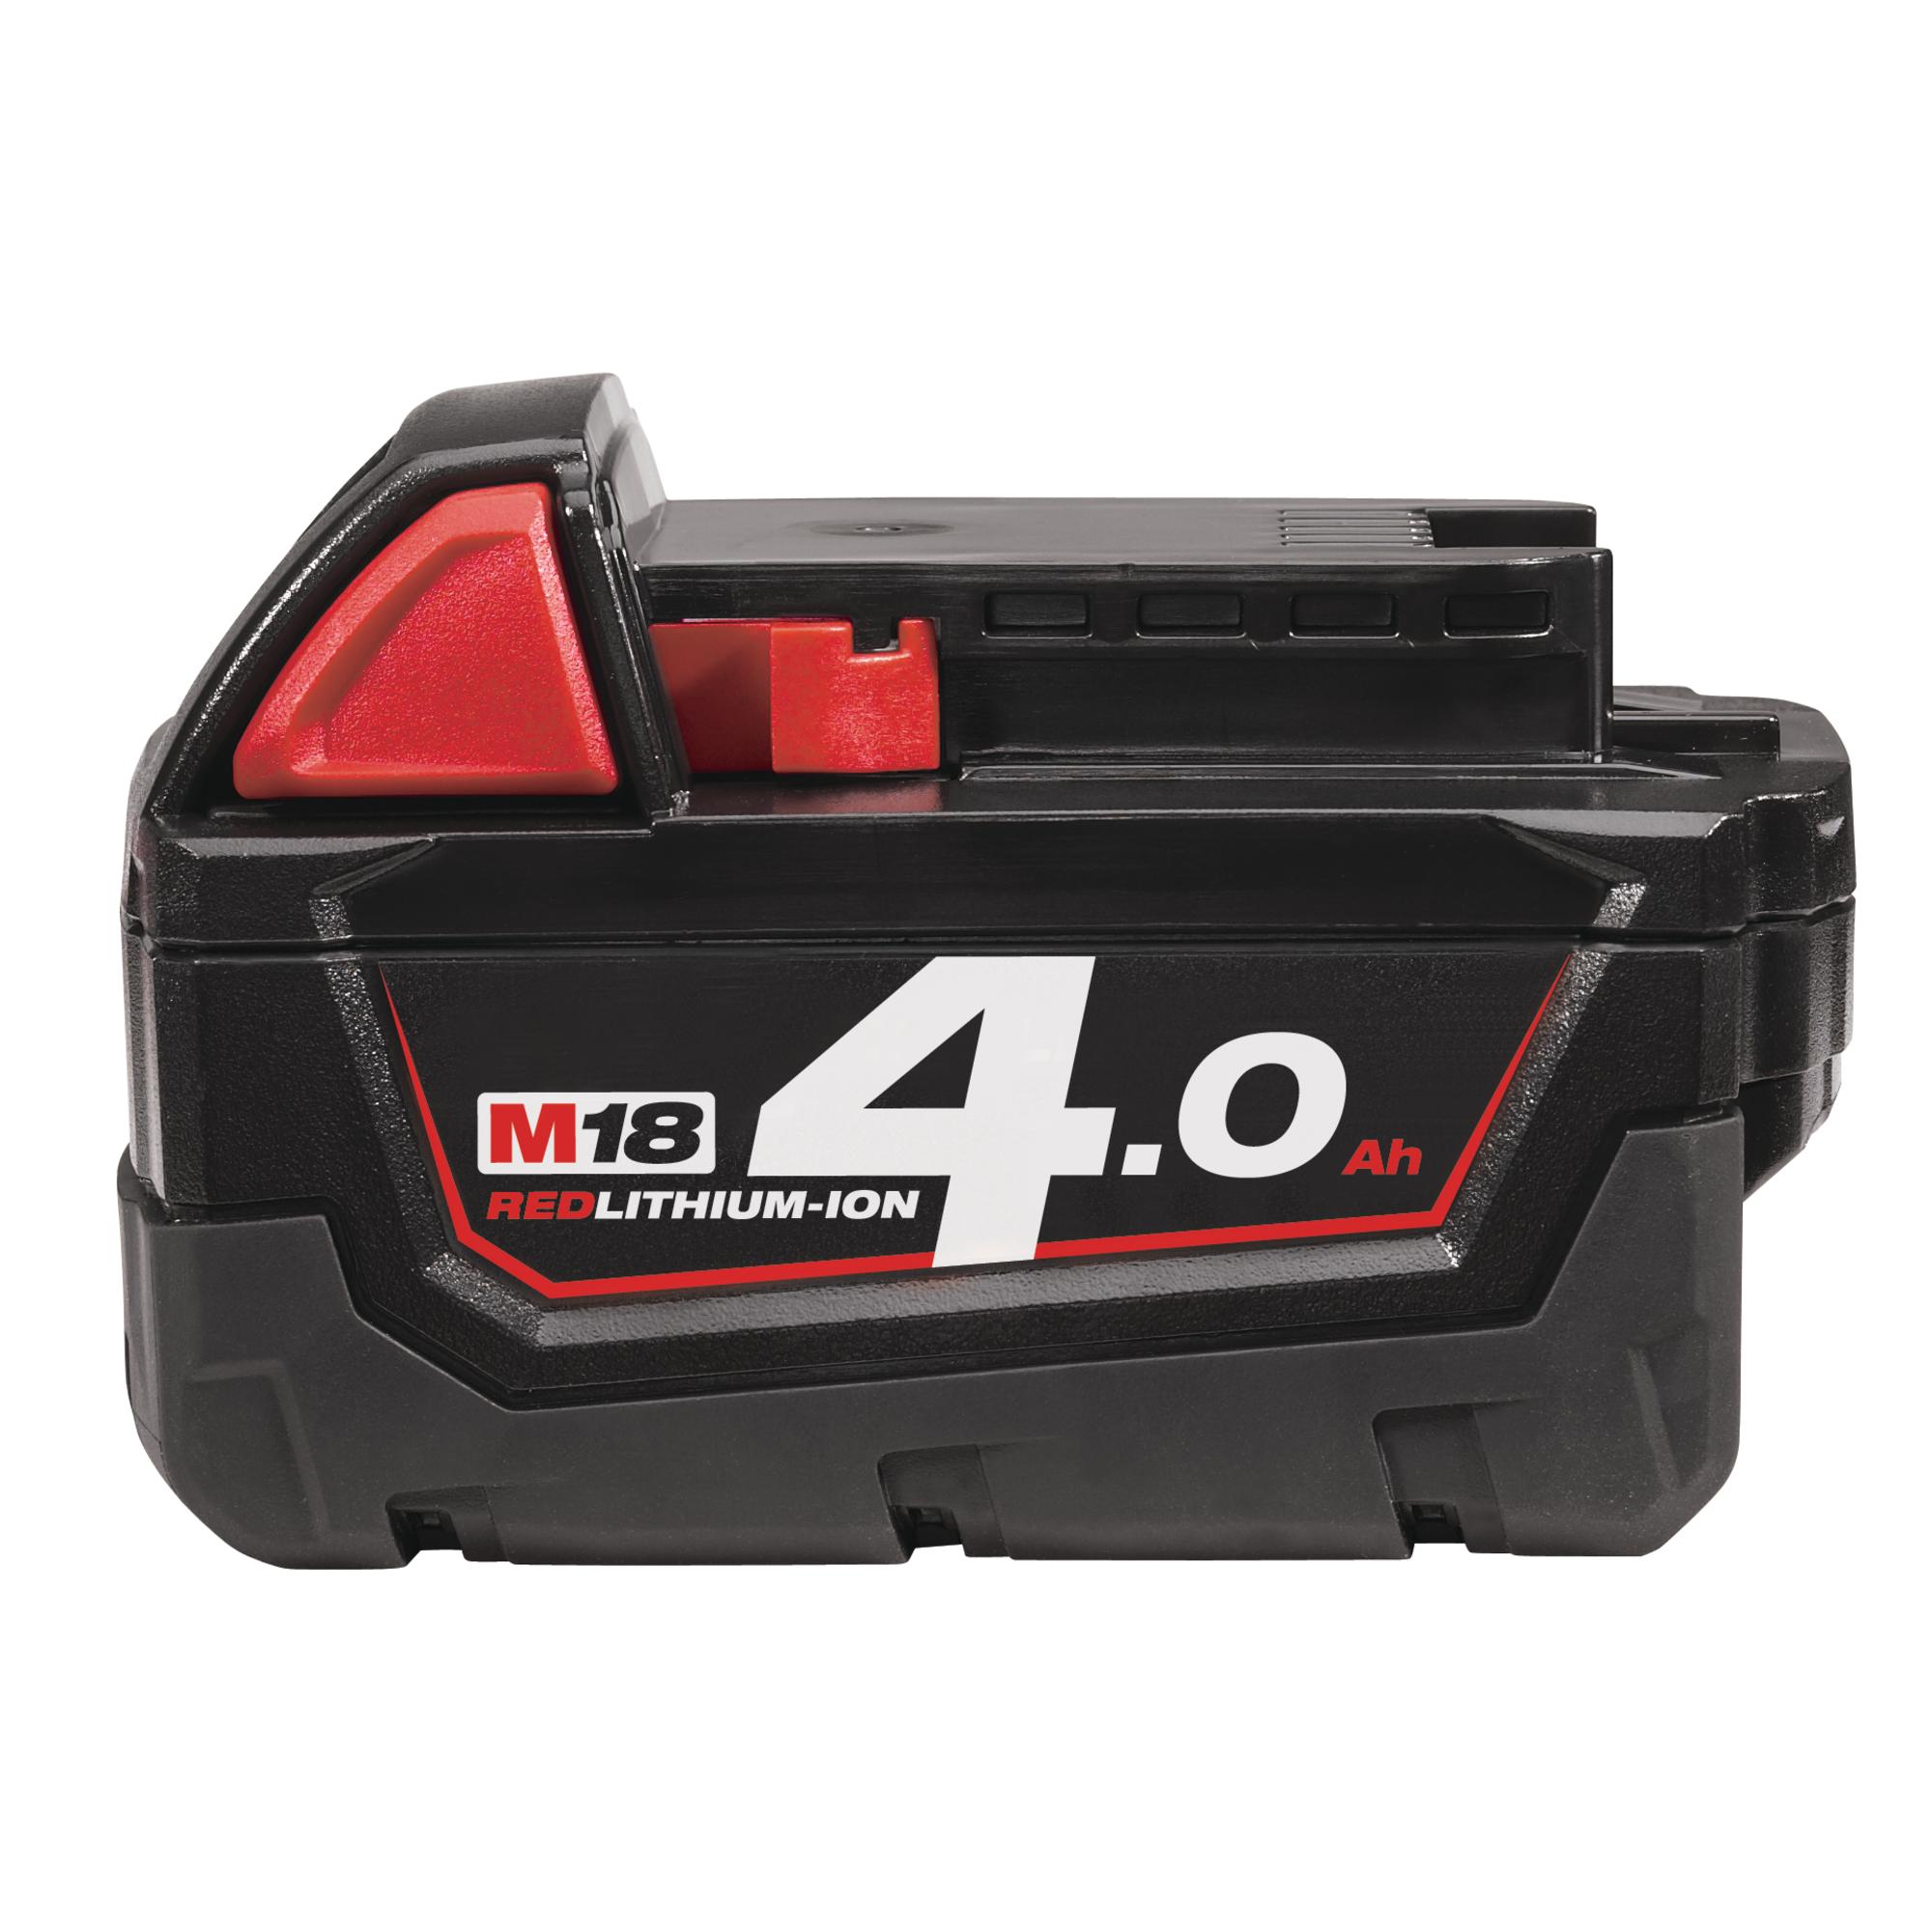 M18™ akumulator 4.0 Ah